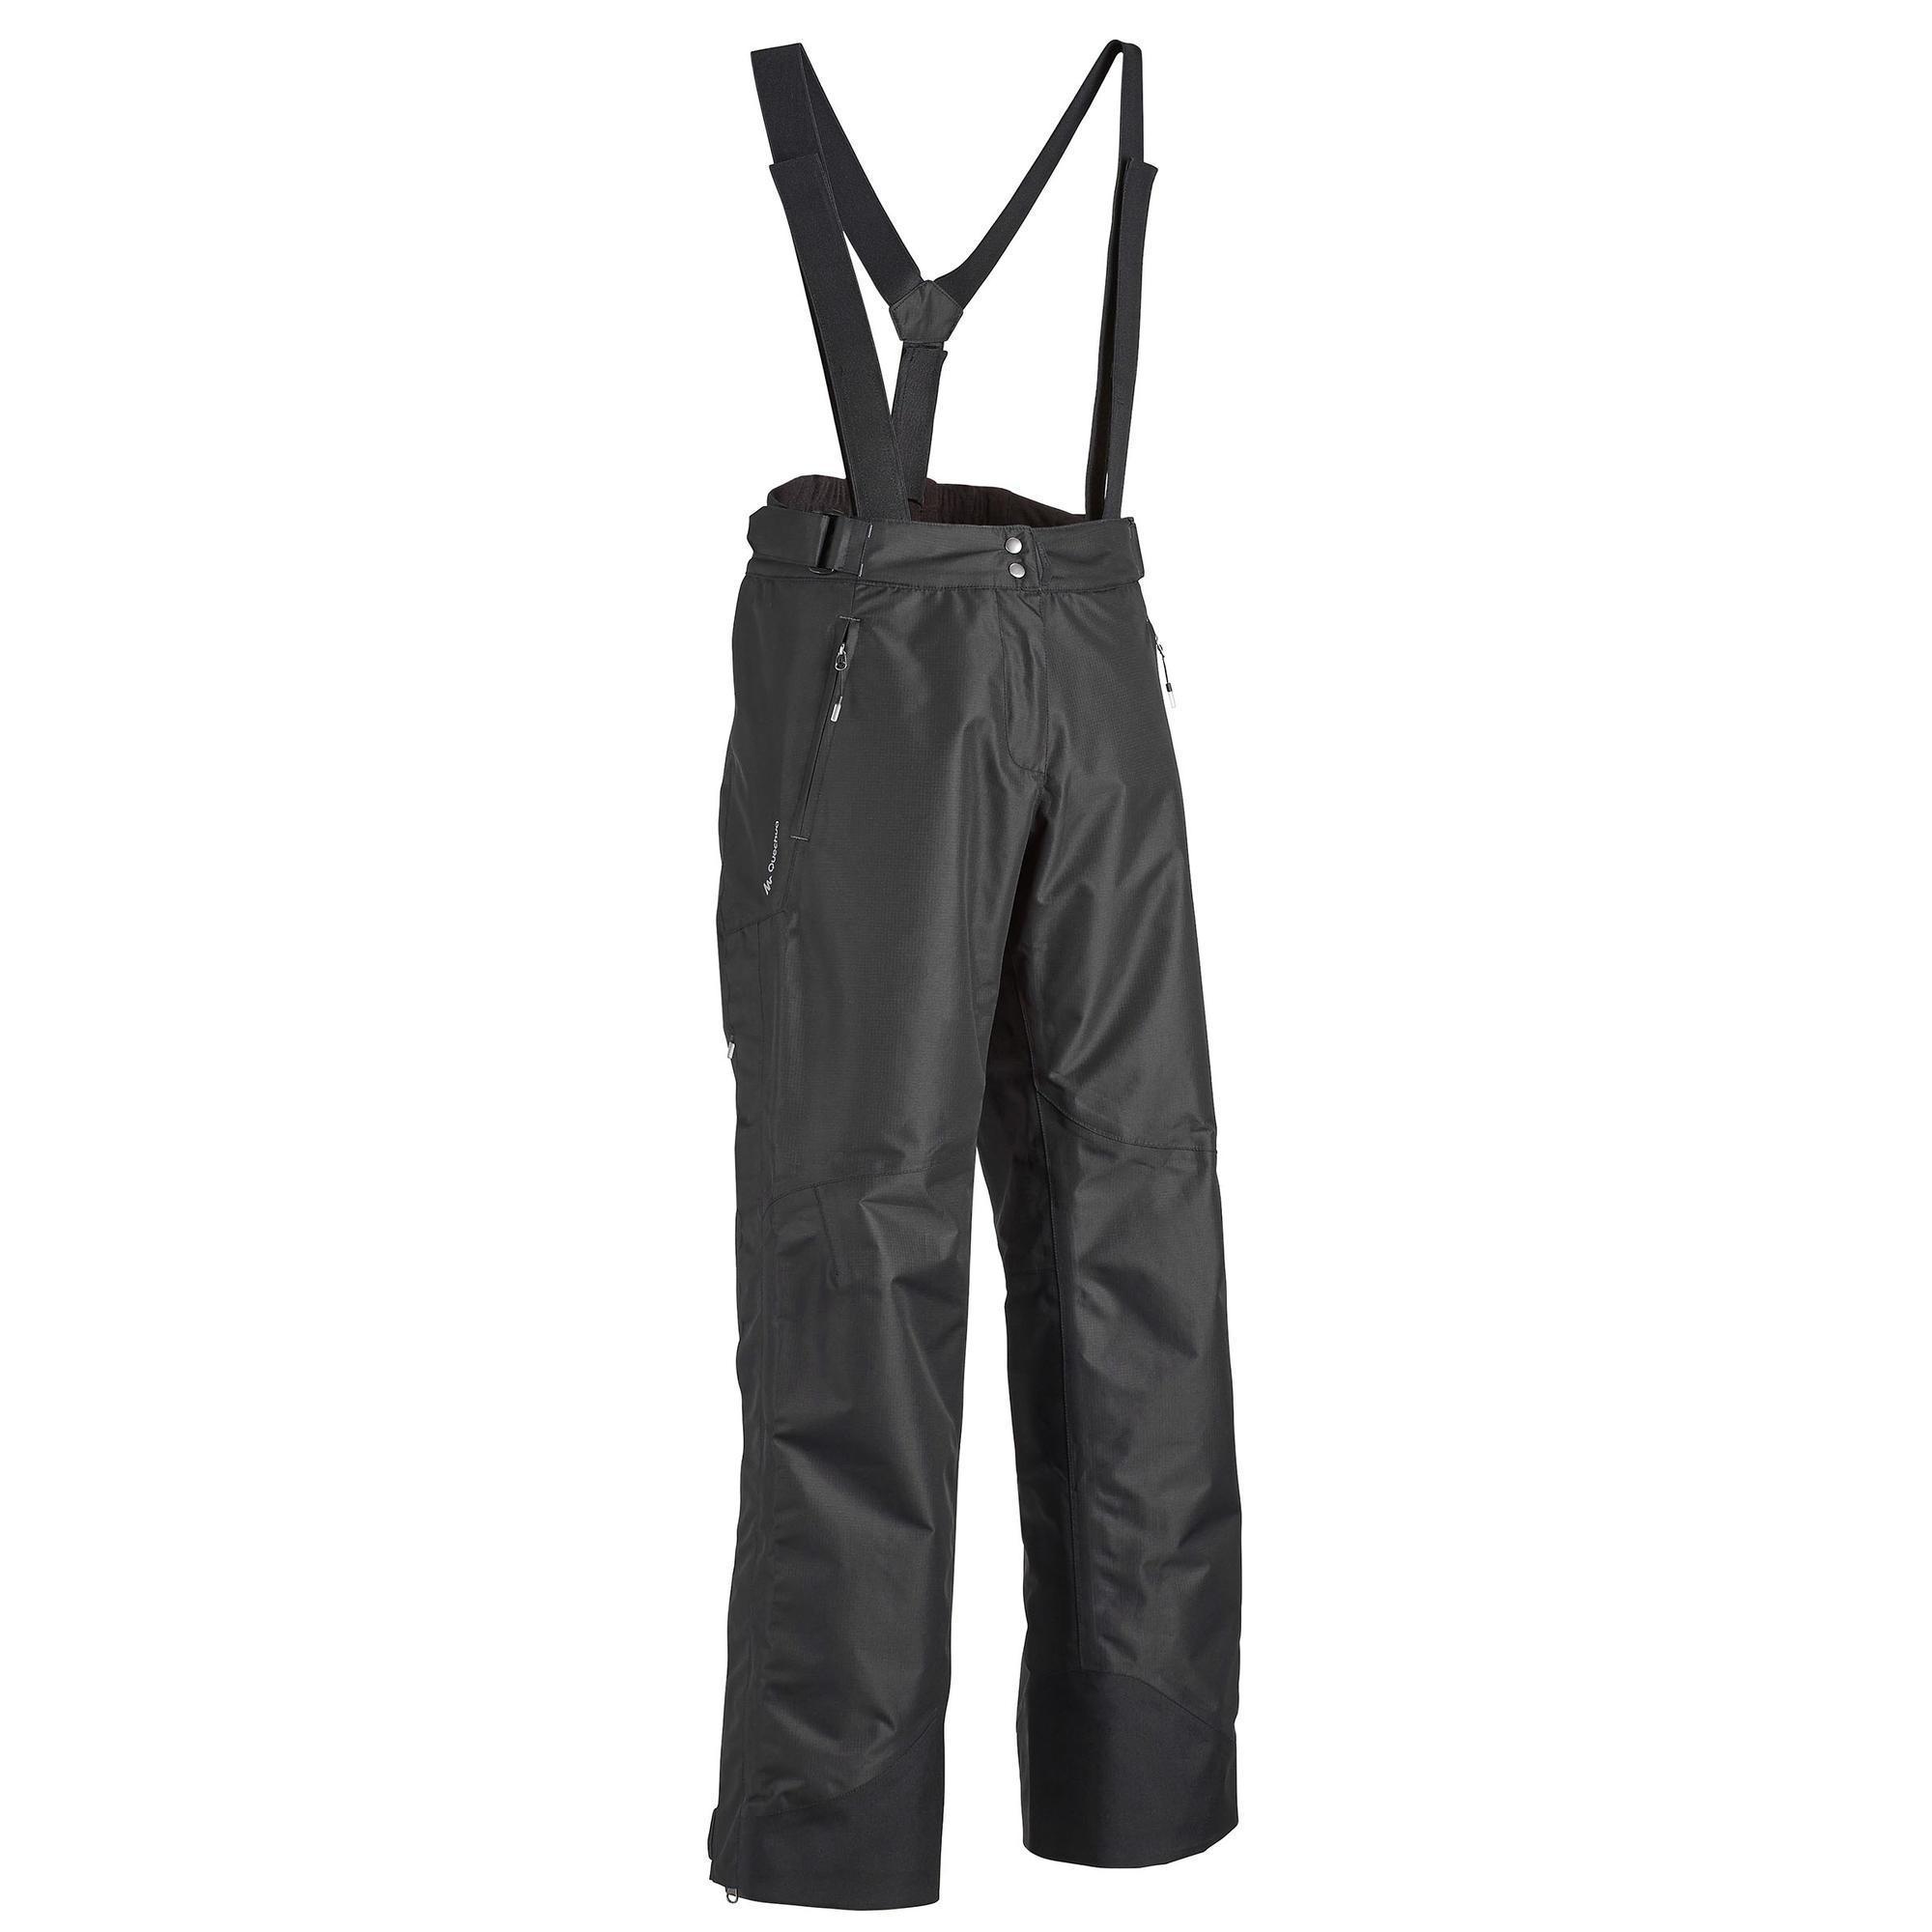 Regenhose MH500 Damen schwarz | Sportbekleidung > Sporthosen > Regenhosen | Schwarz | Quechua